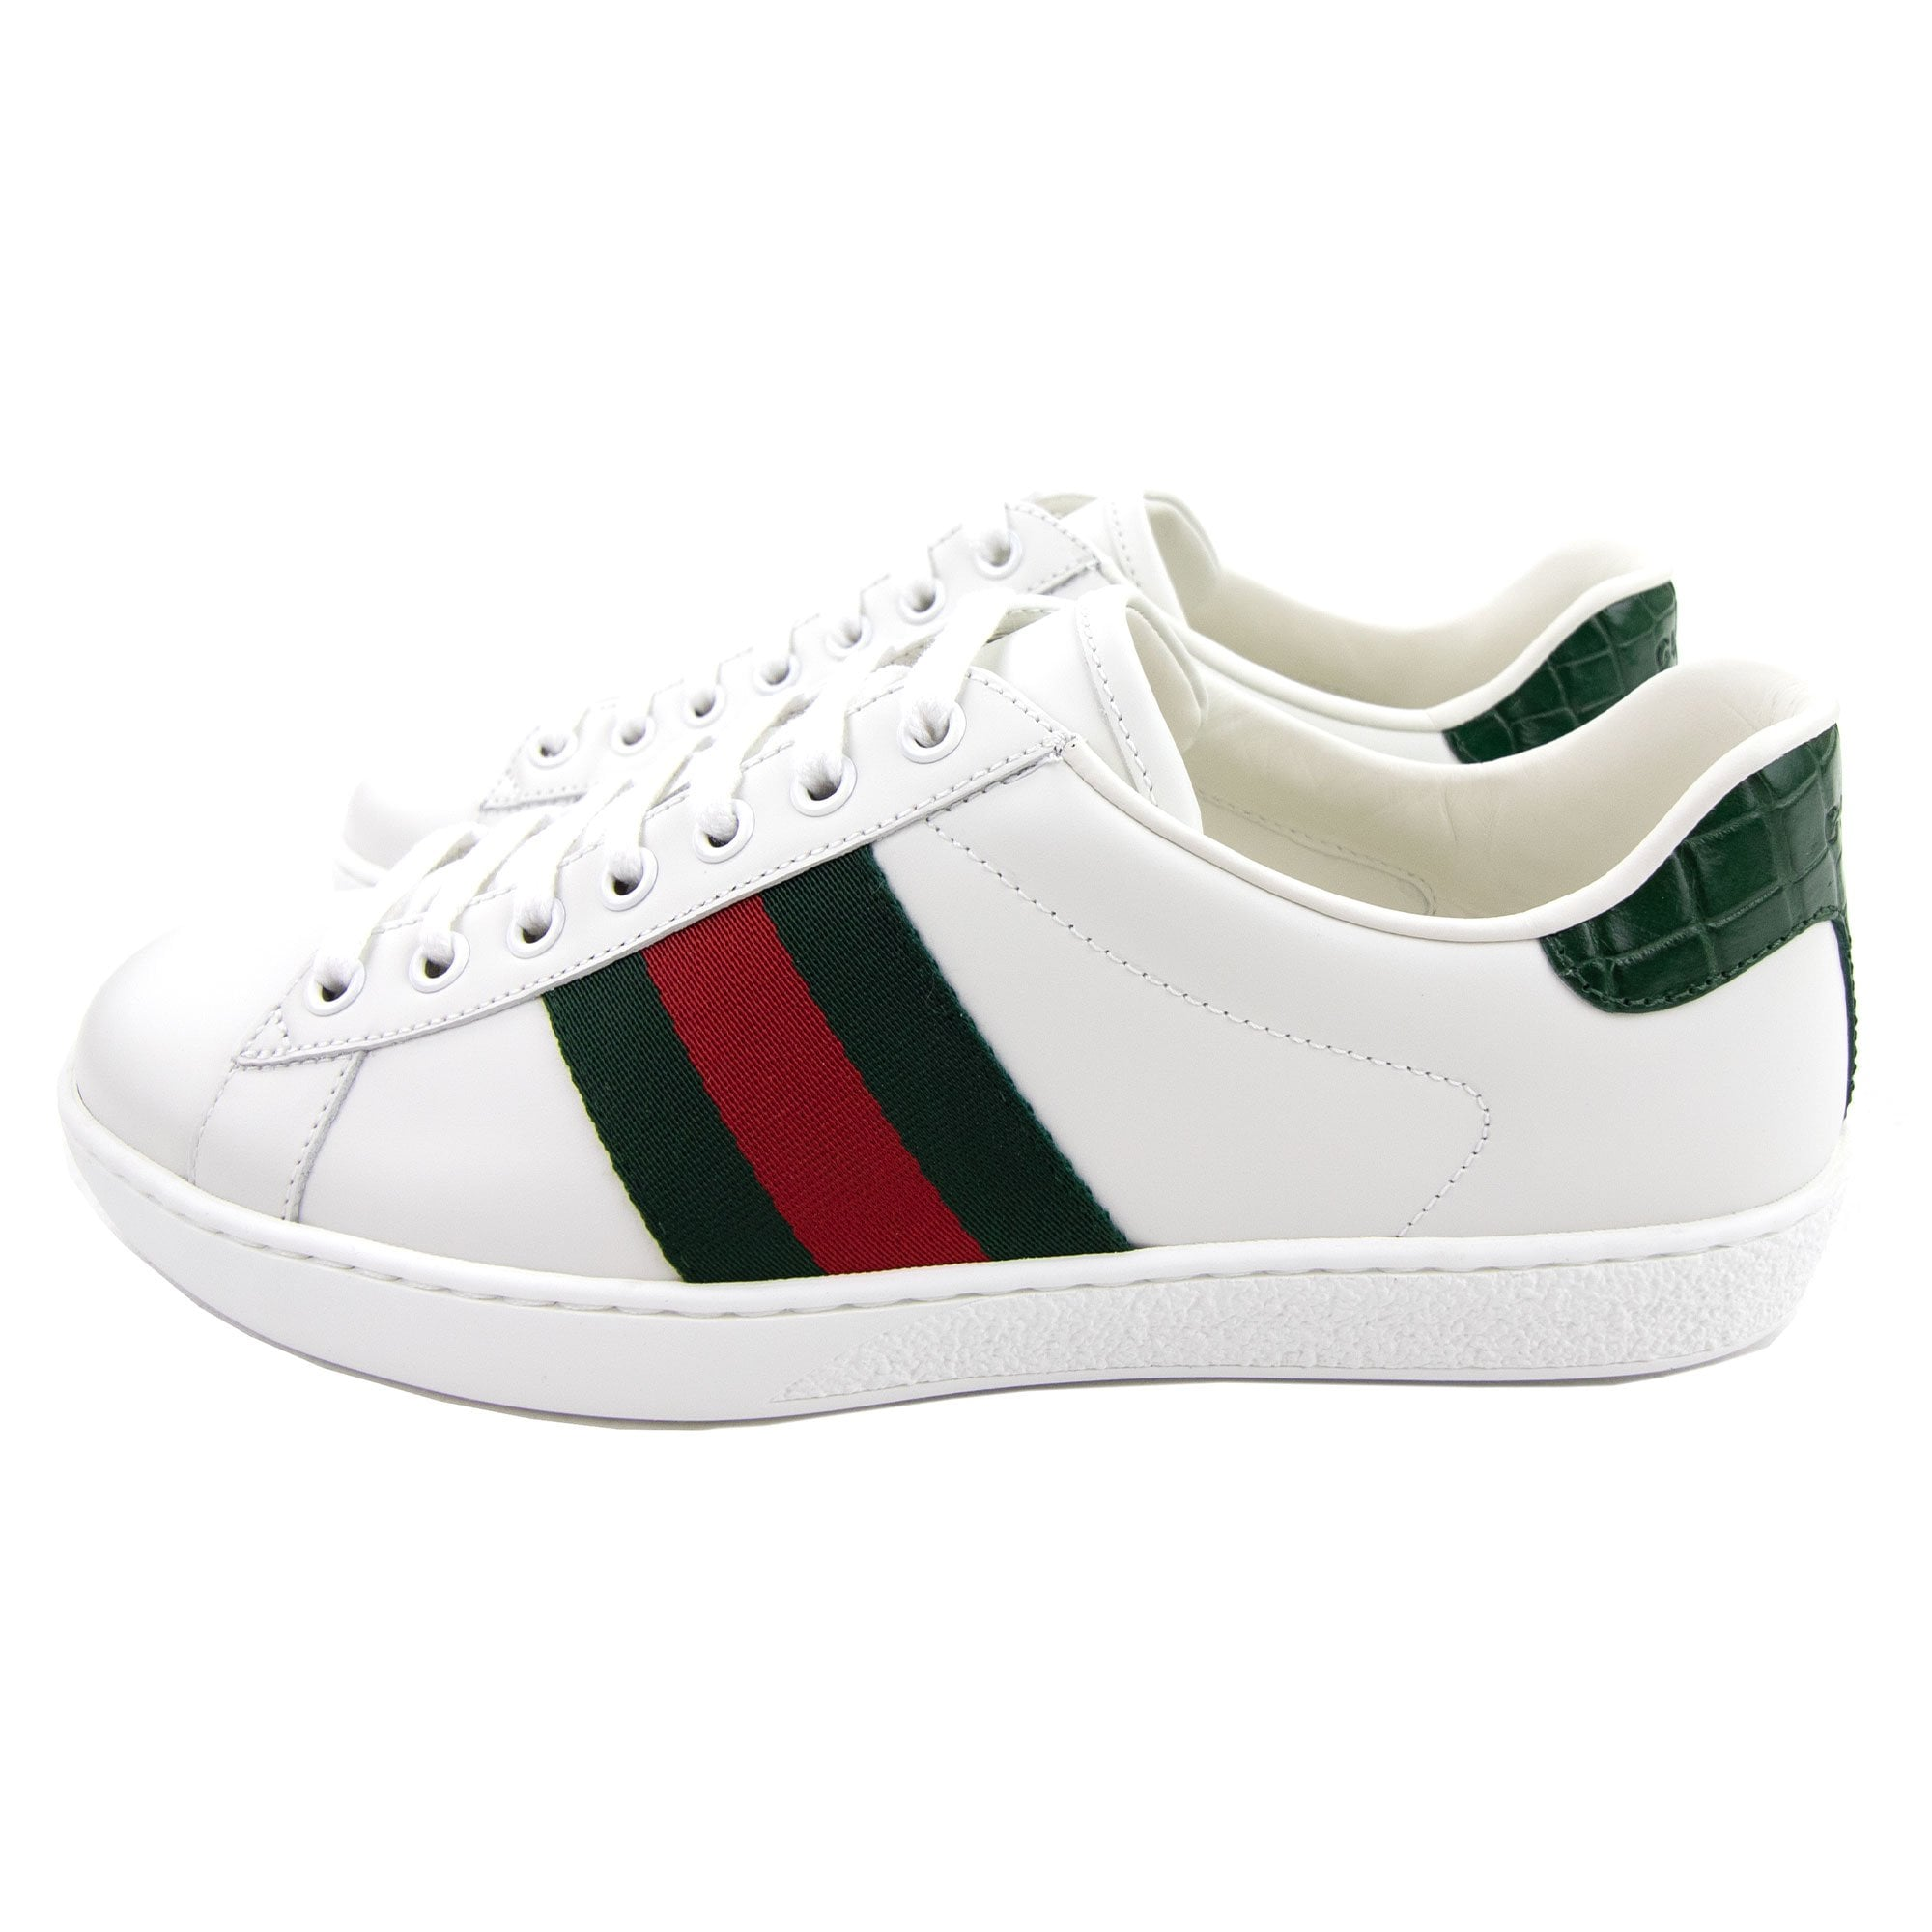 Gucci Ace Leather Sneaker White | ONU